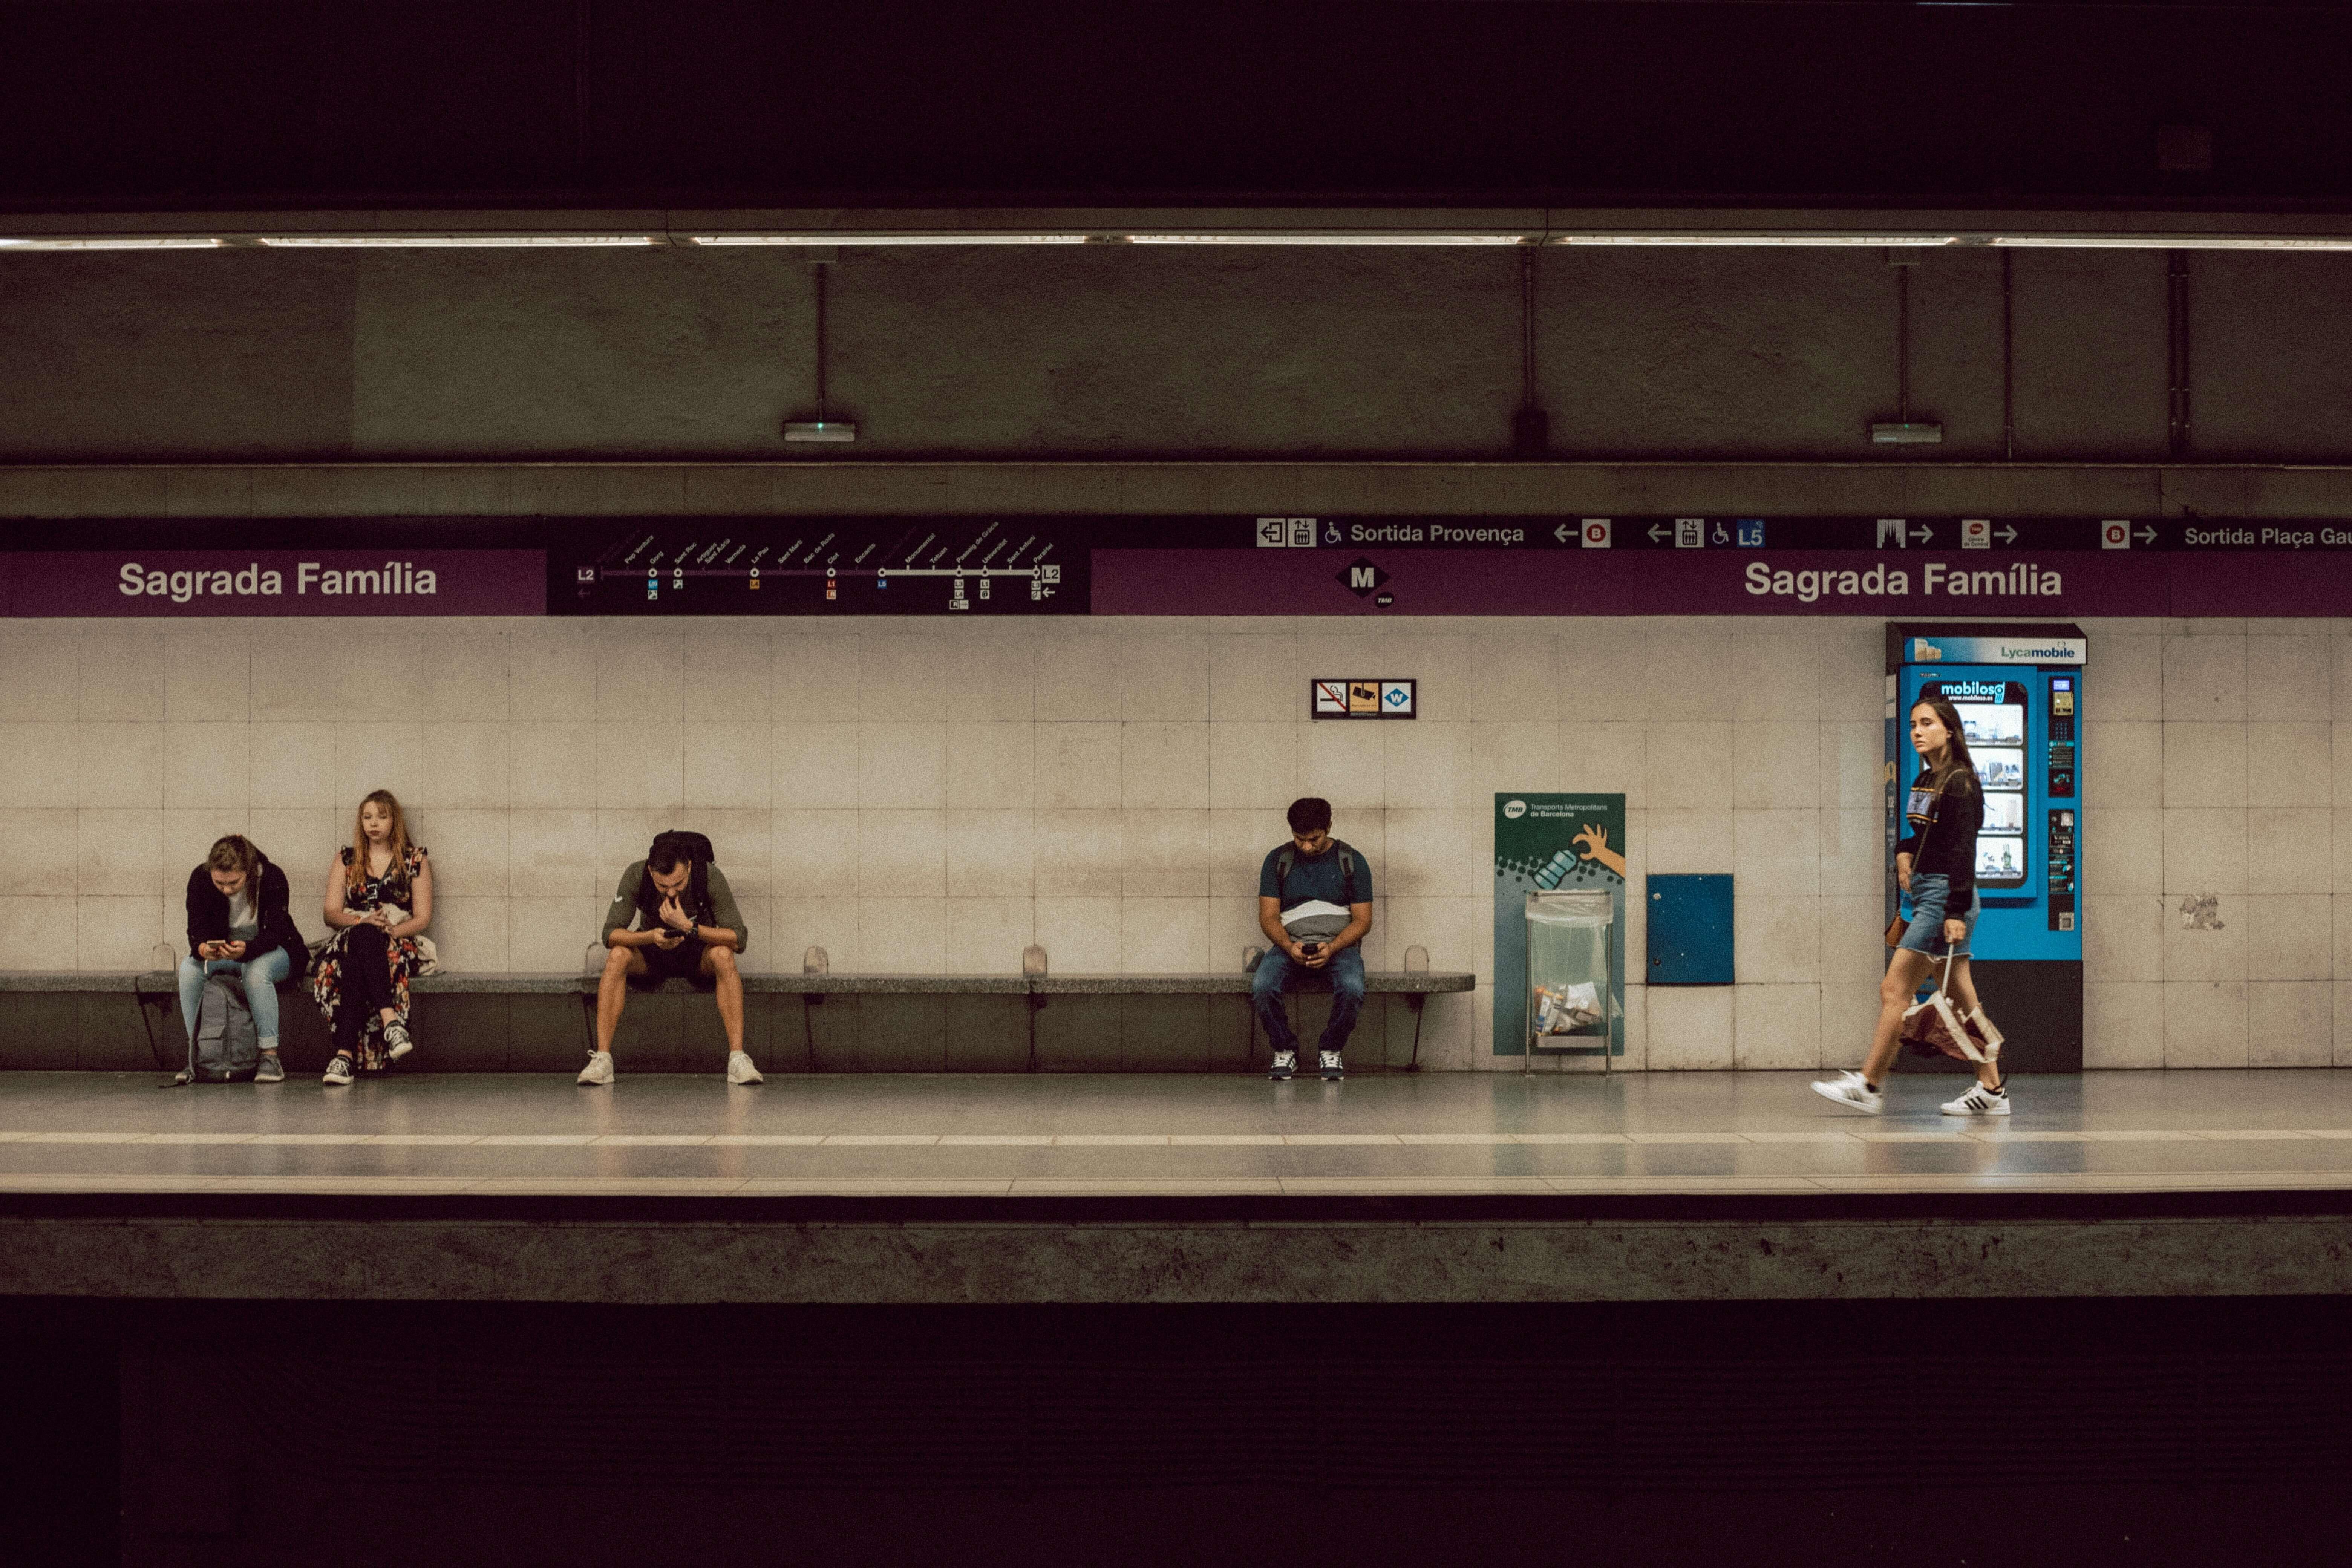 barcelona metro train tracks